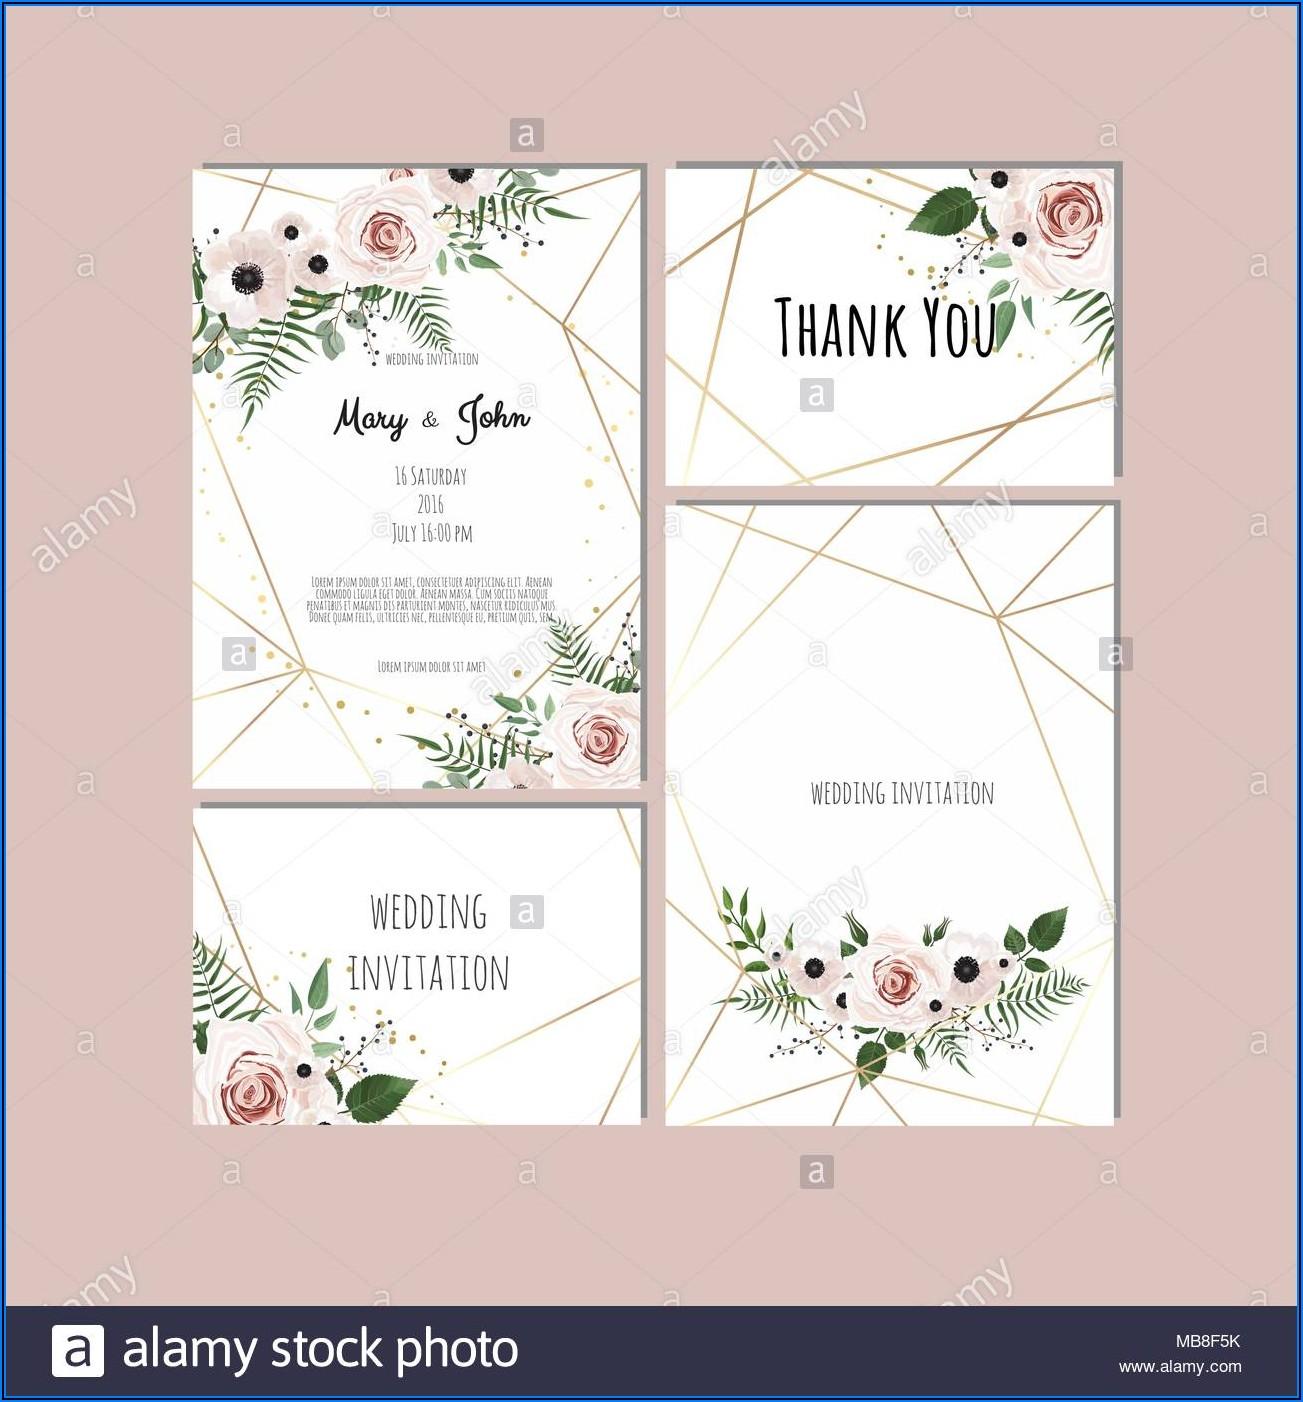 Floral Wedding Invitations Vector